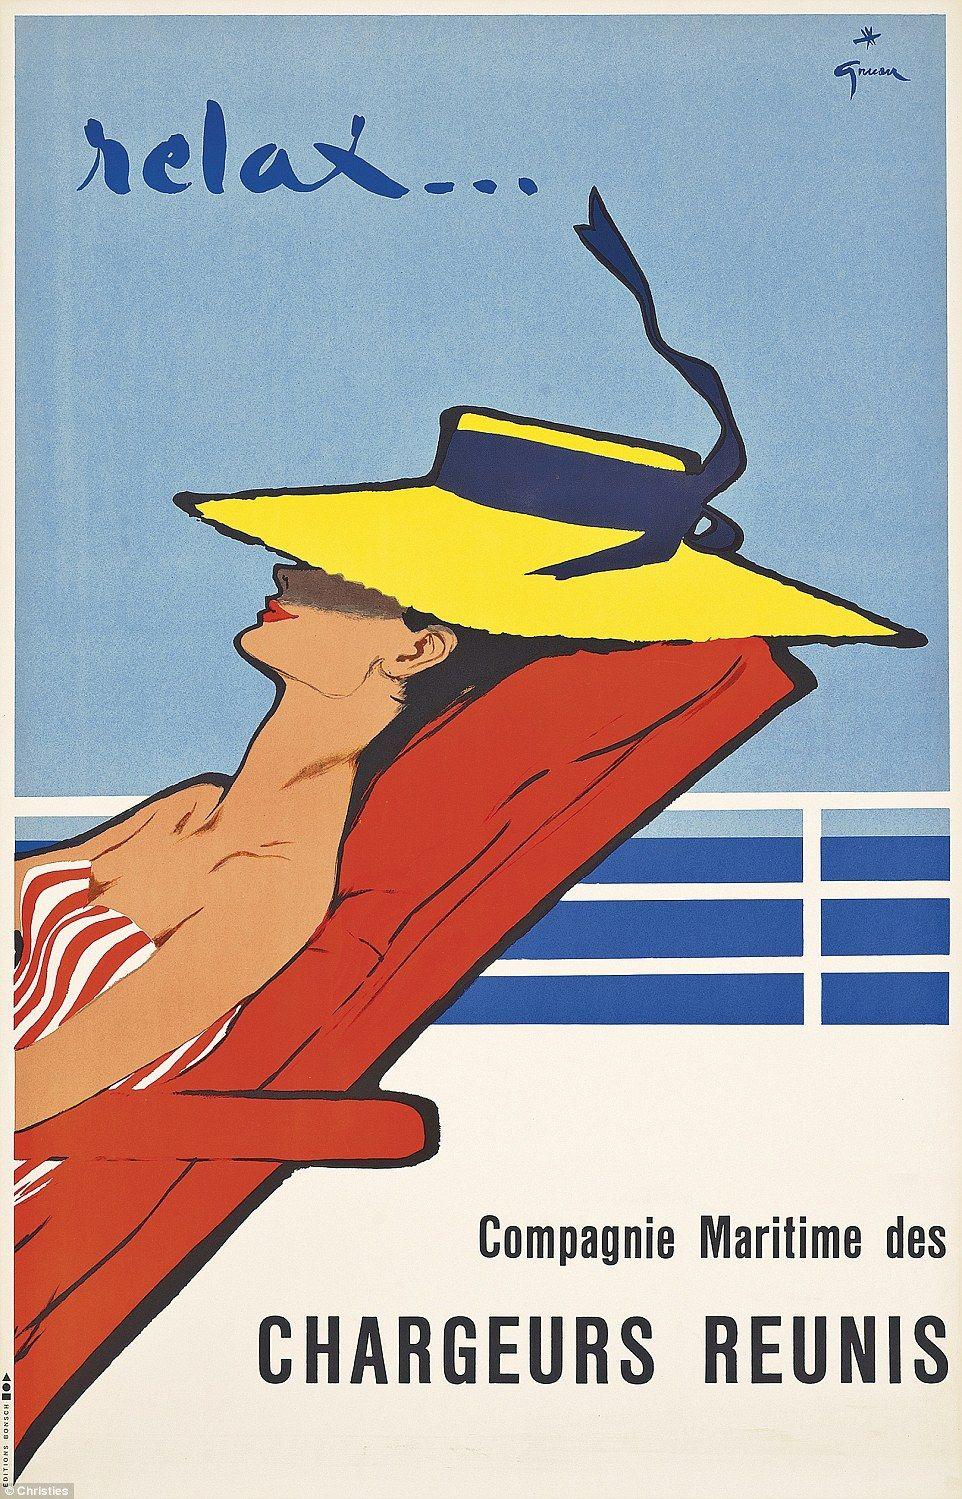 Beautiful Vintage Posters